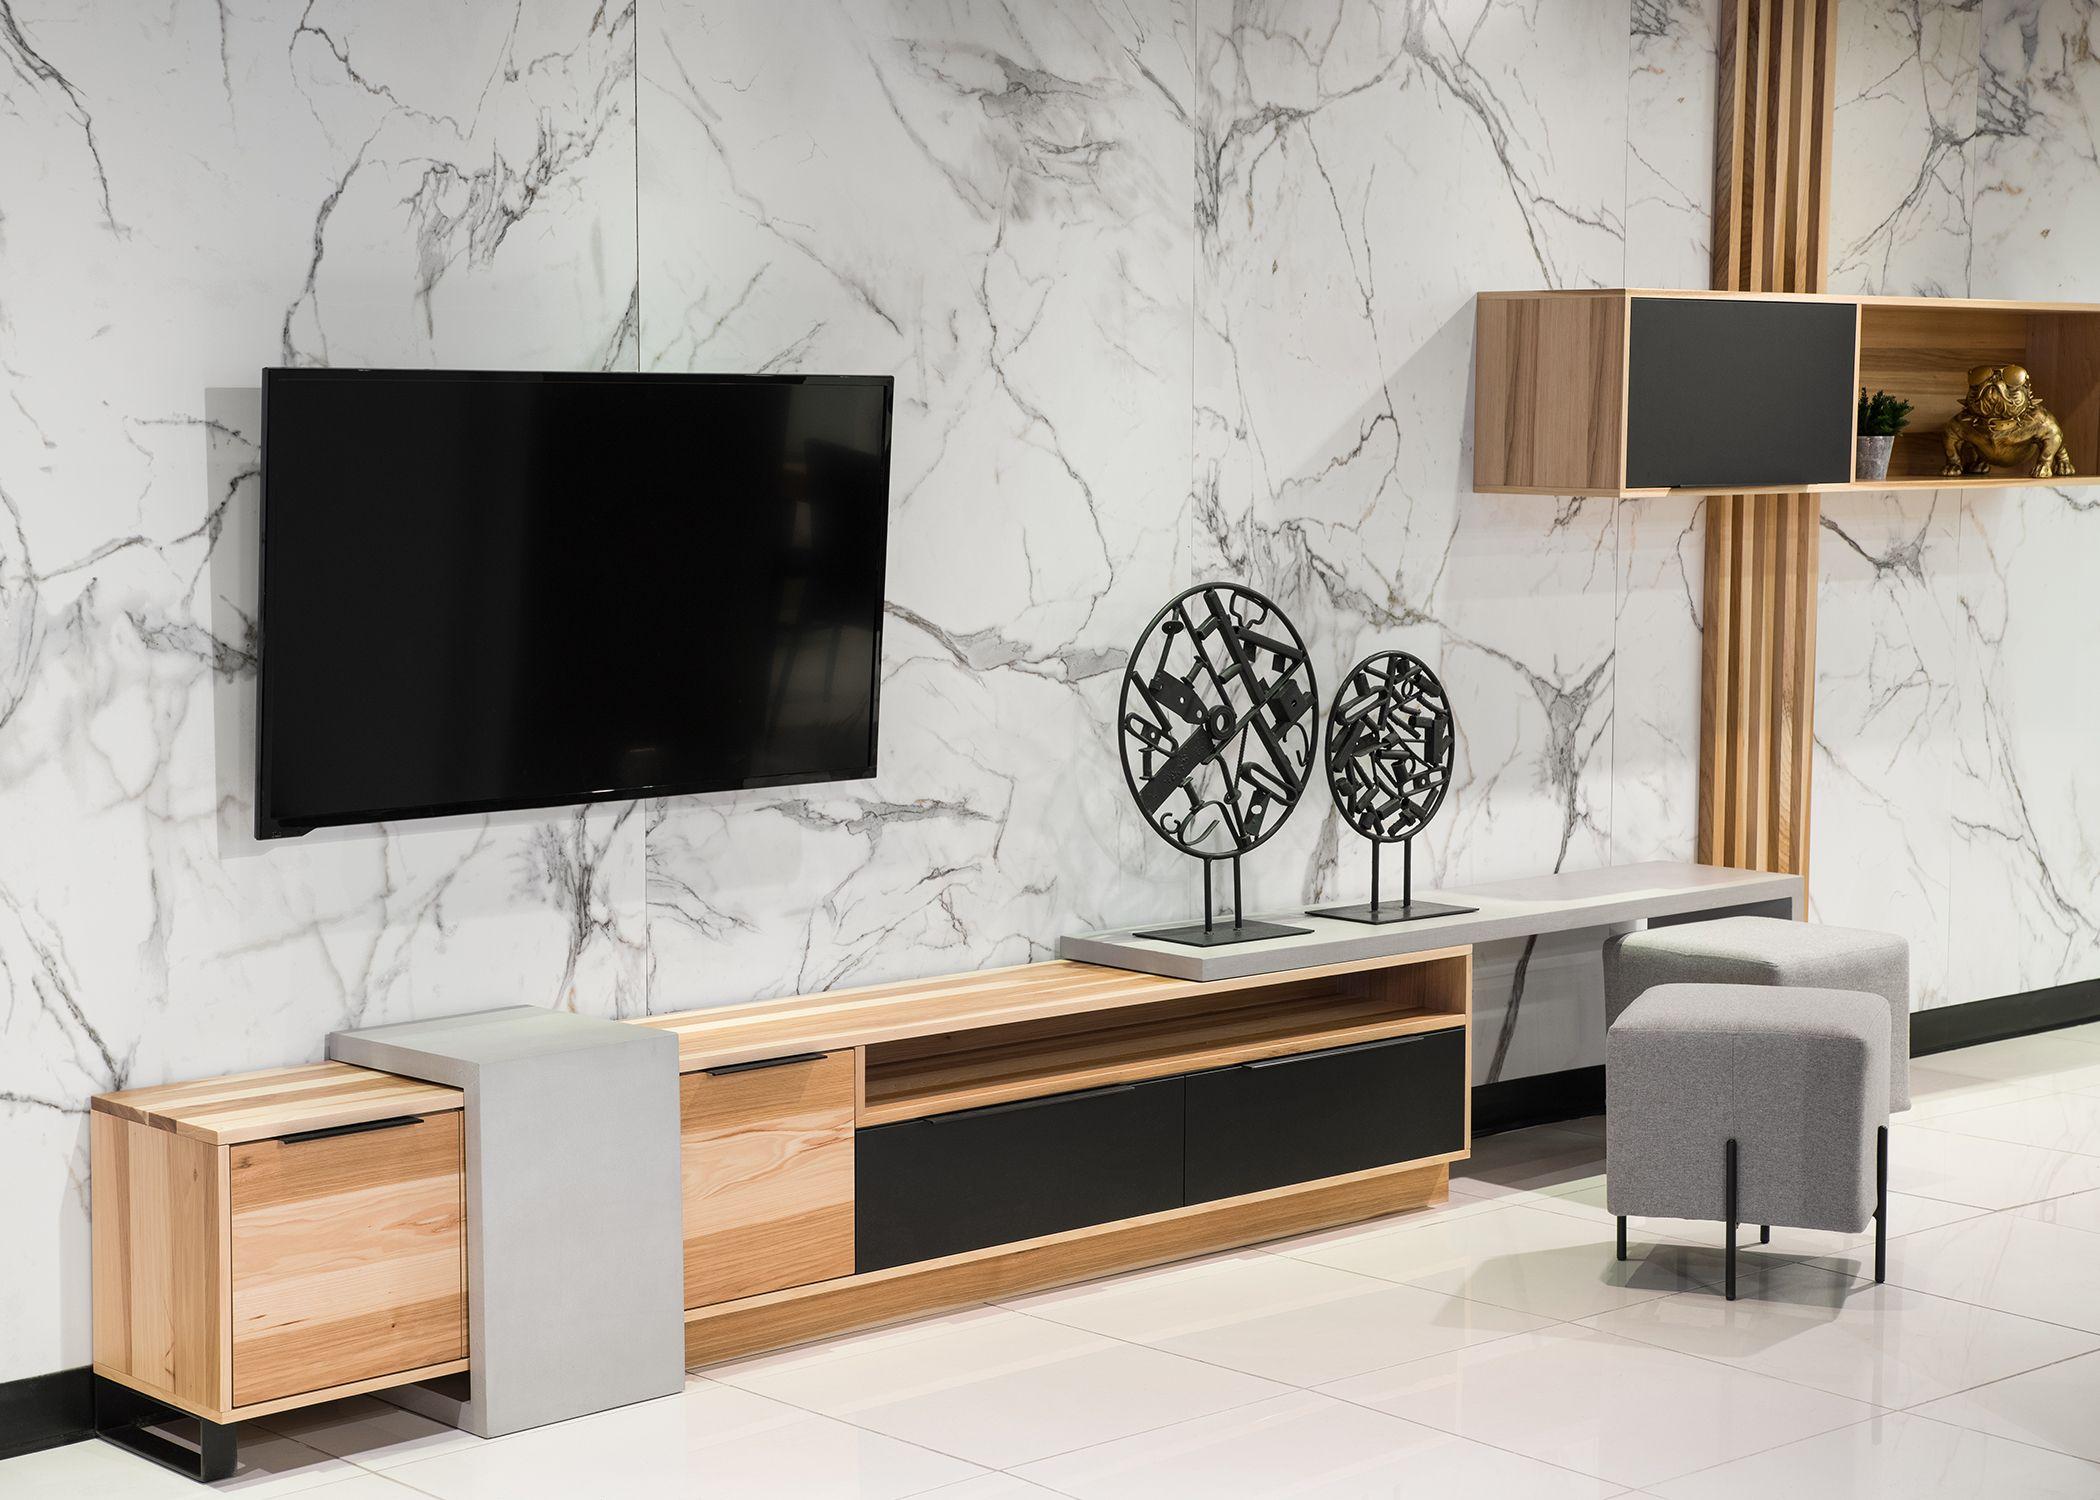 Meuble Tele Montcalm Hickory Opaco Table En C Bellechasse Table En L Bellechasse Beton Ciment Huche Flat Screen Electronic Products Flatscreen Tv